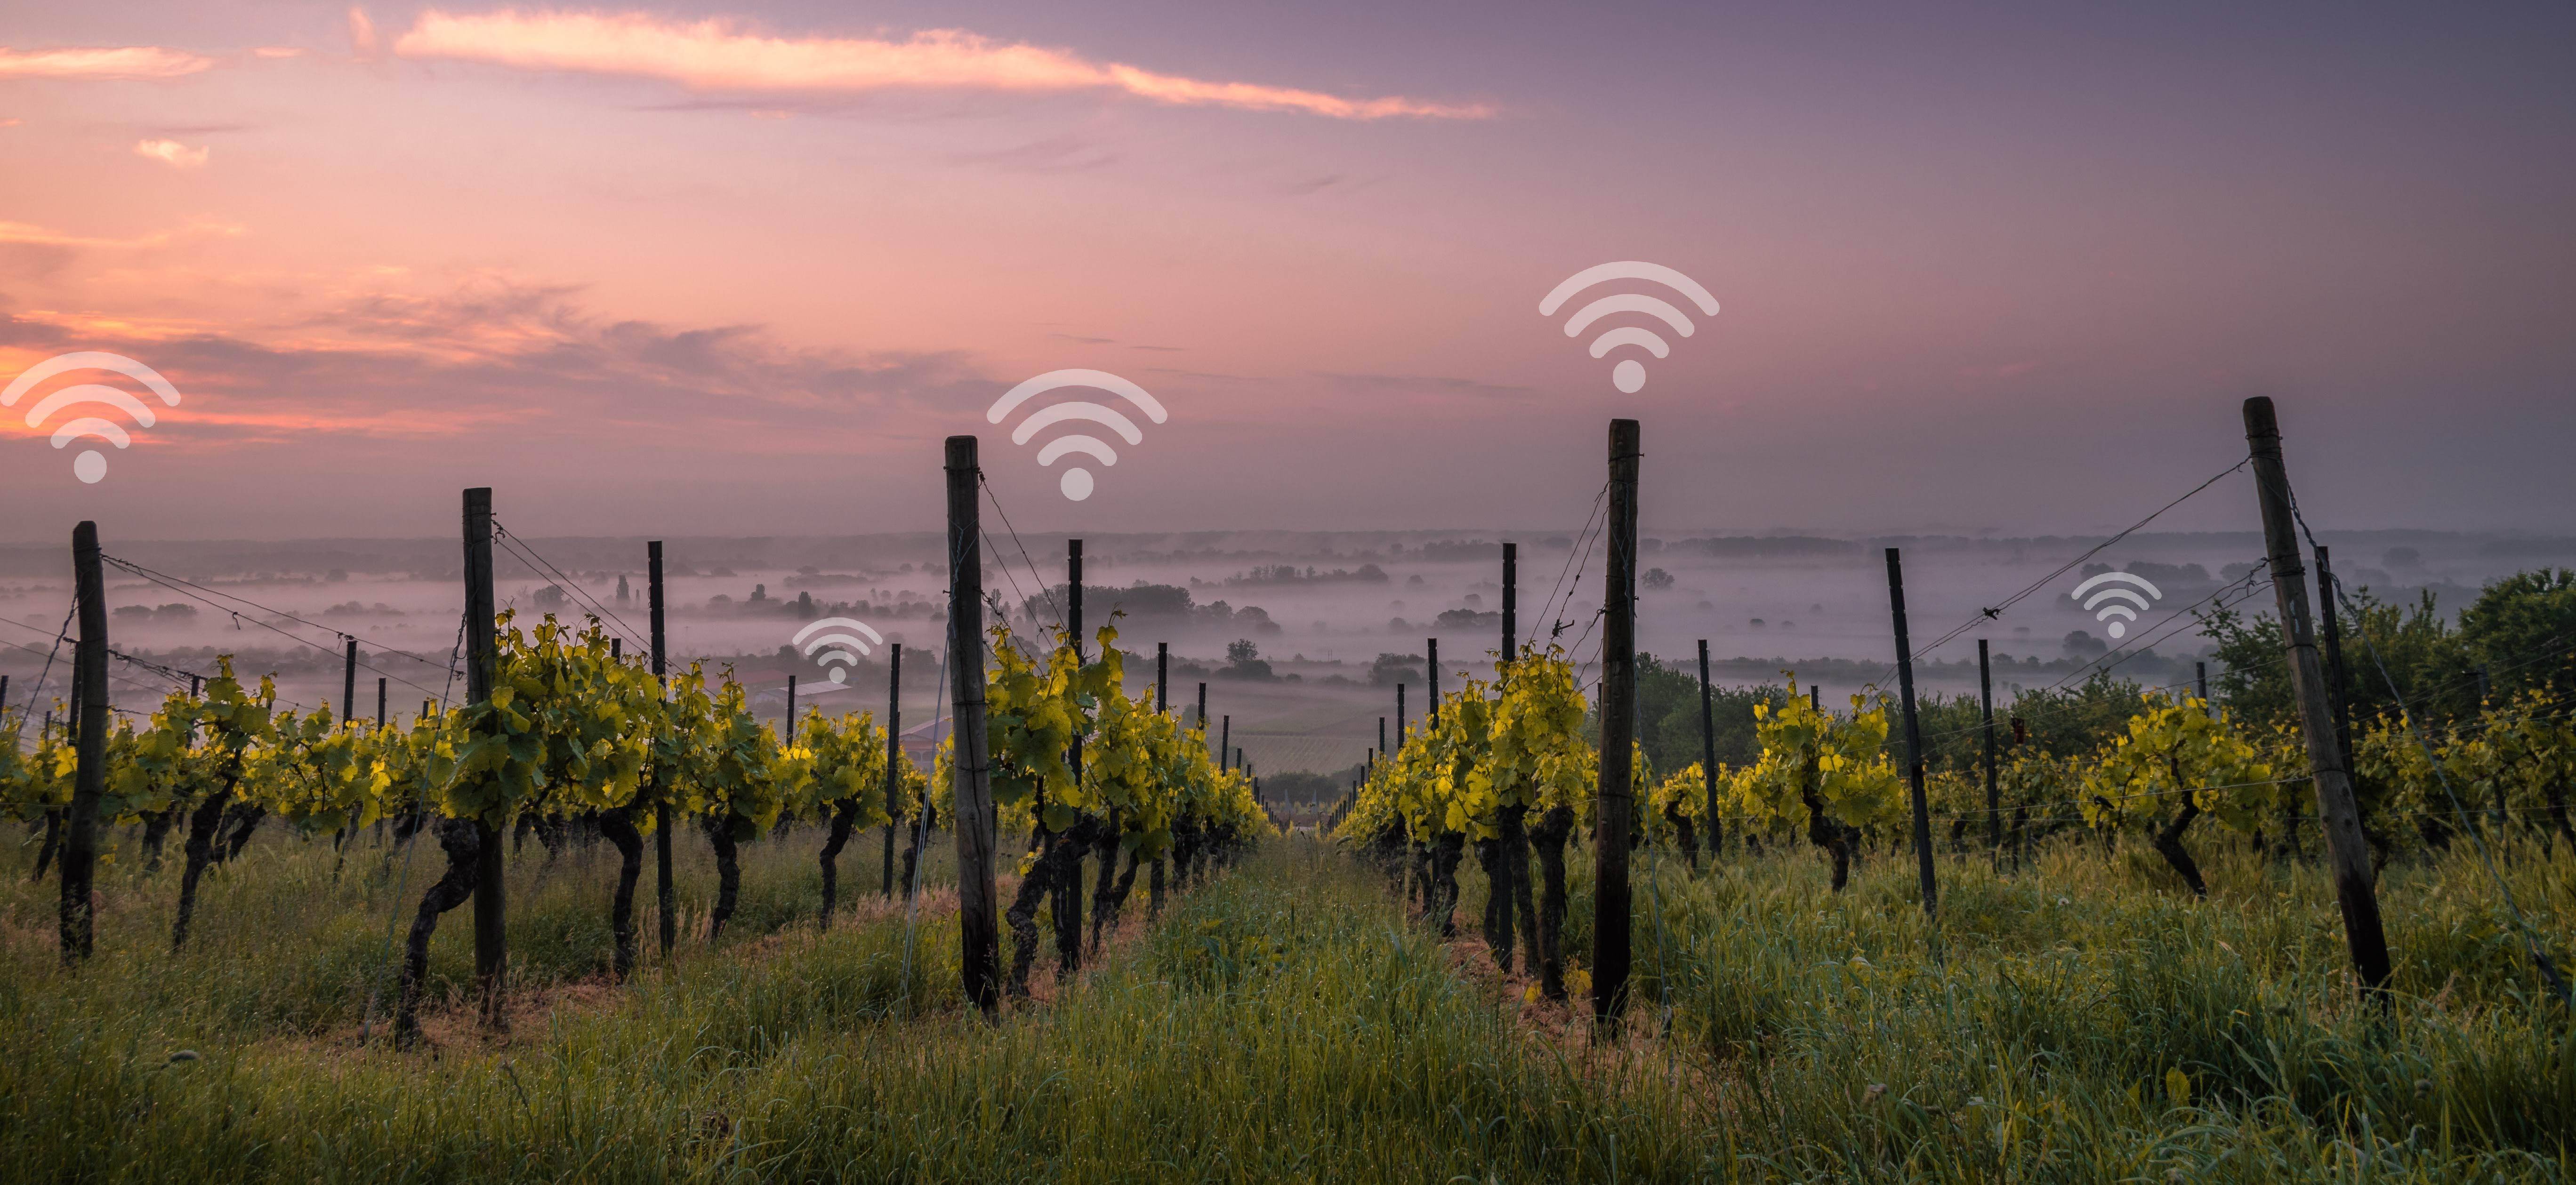 Internet of Wines Benefits